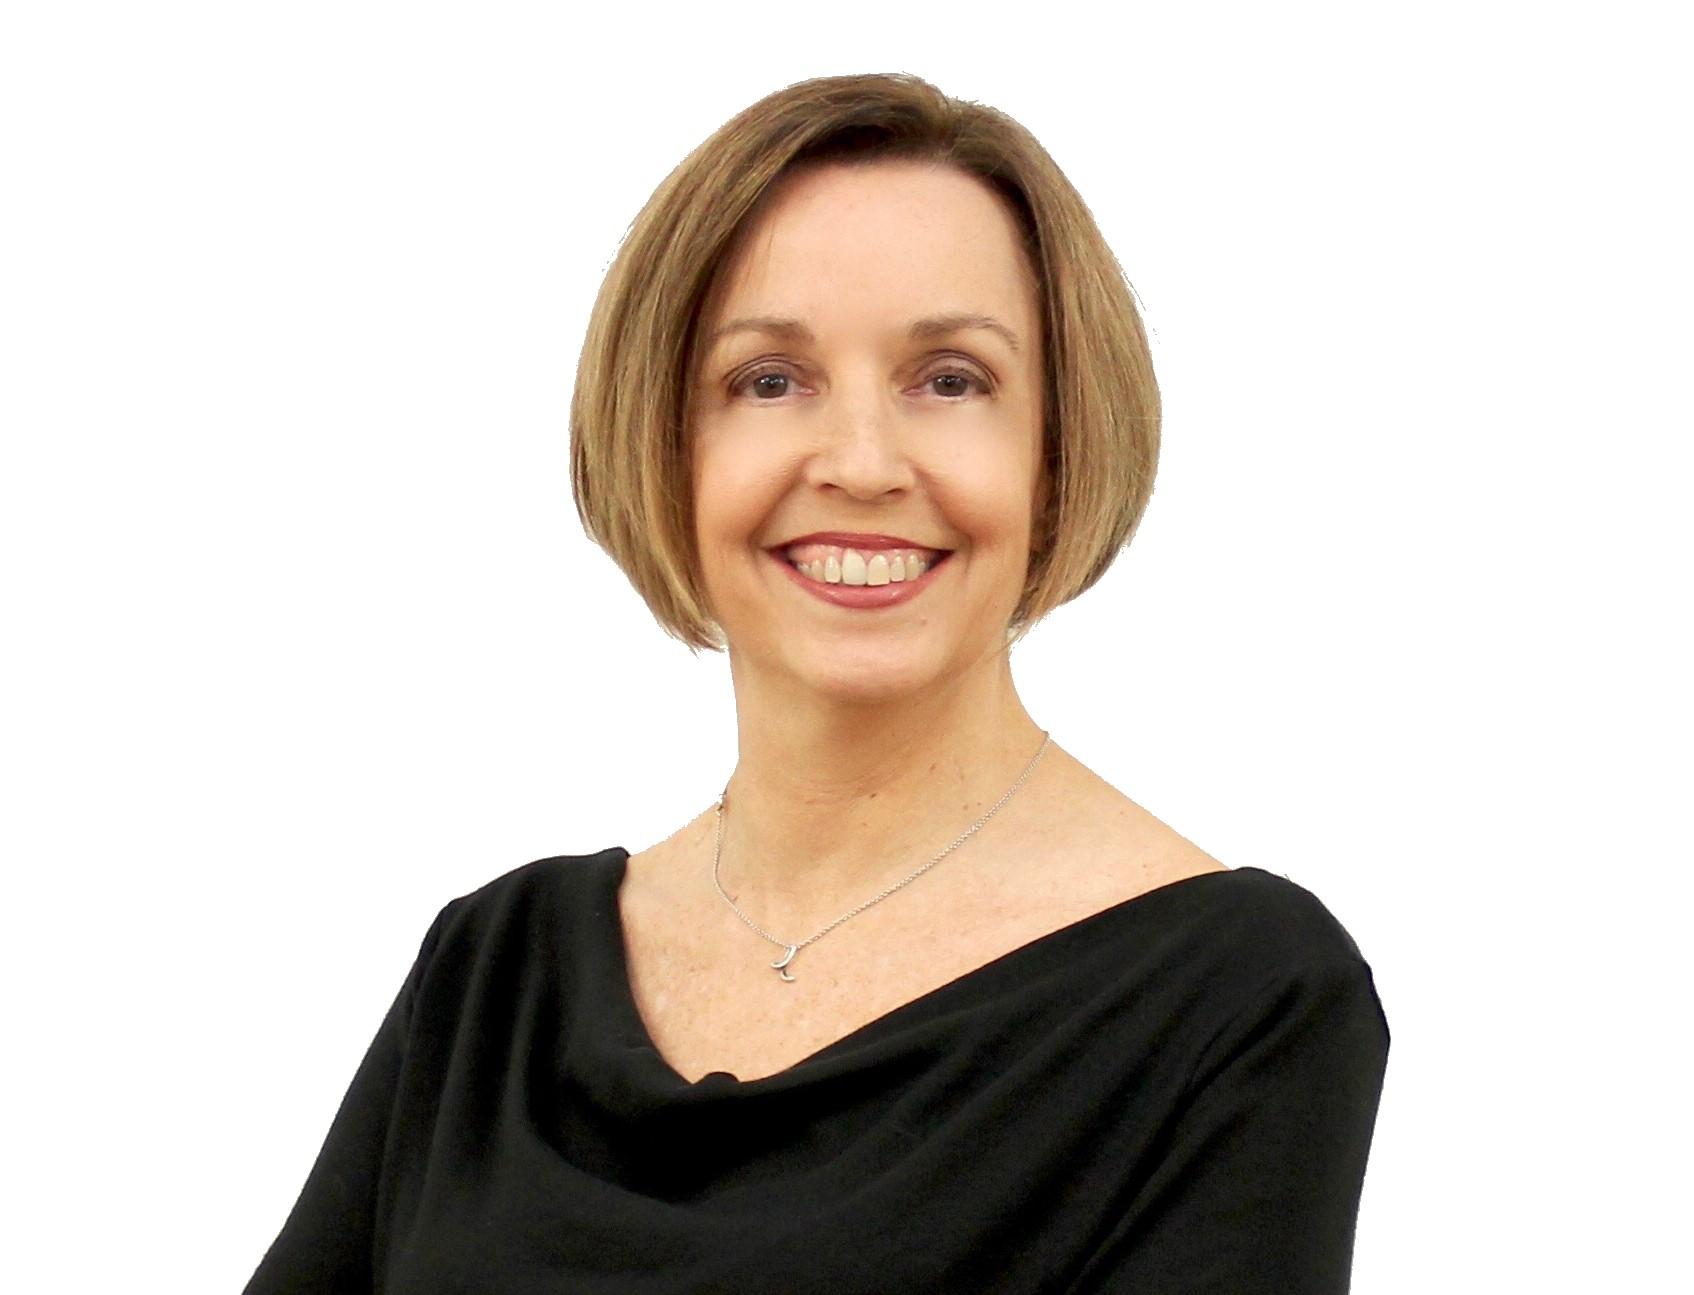 Elaine Fullerton